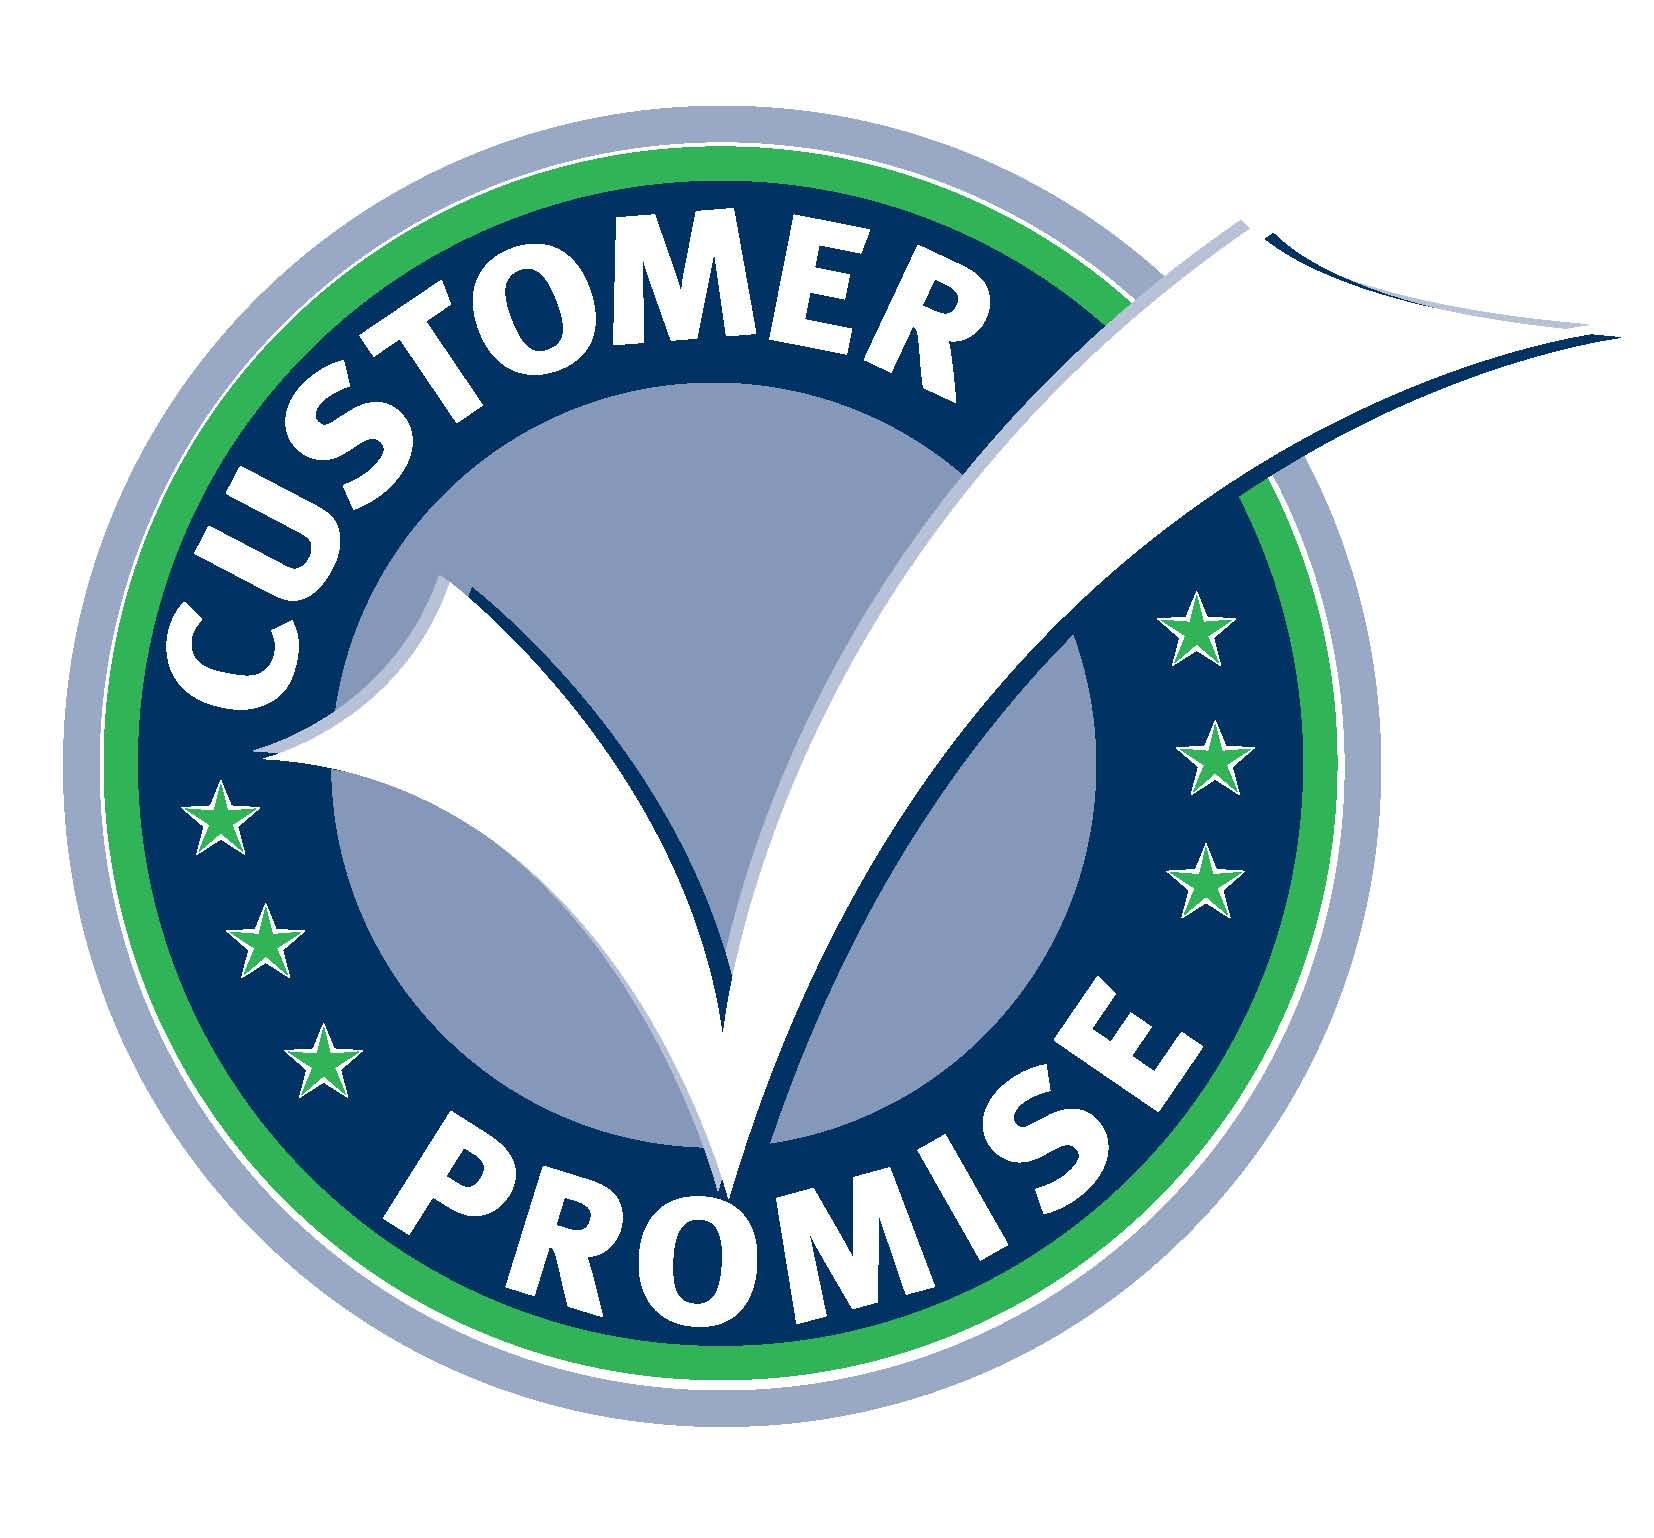 Customer Service Logos  How Do You Define Excellent Customer Service